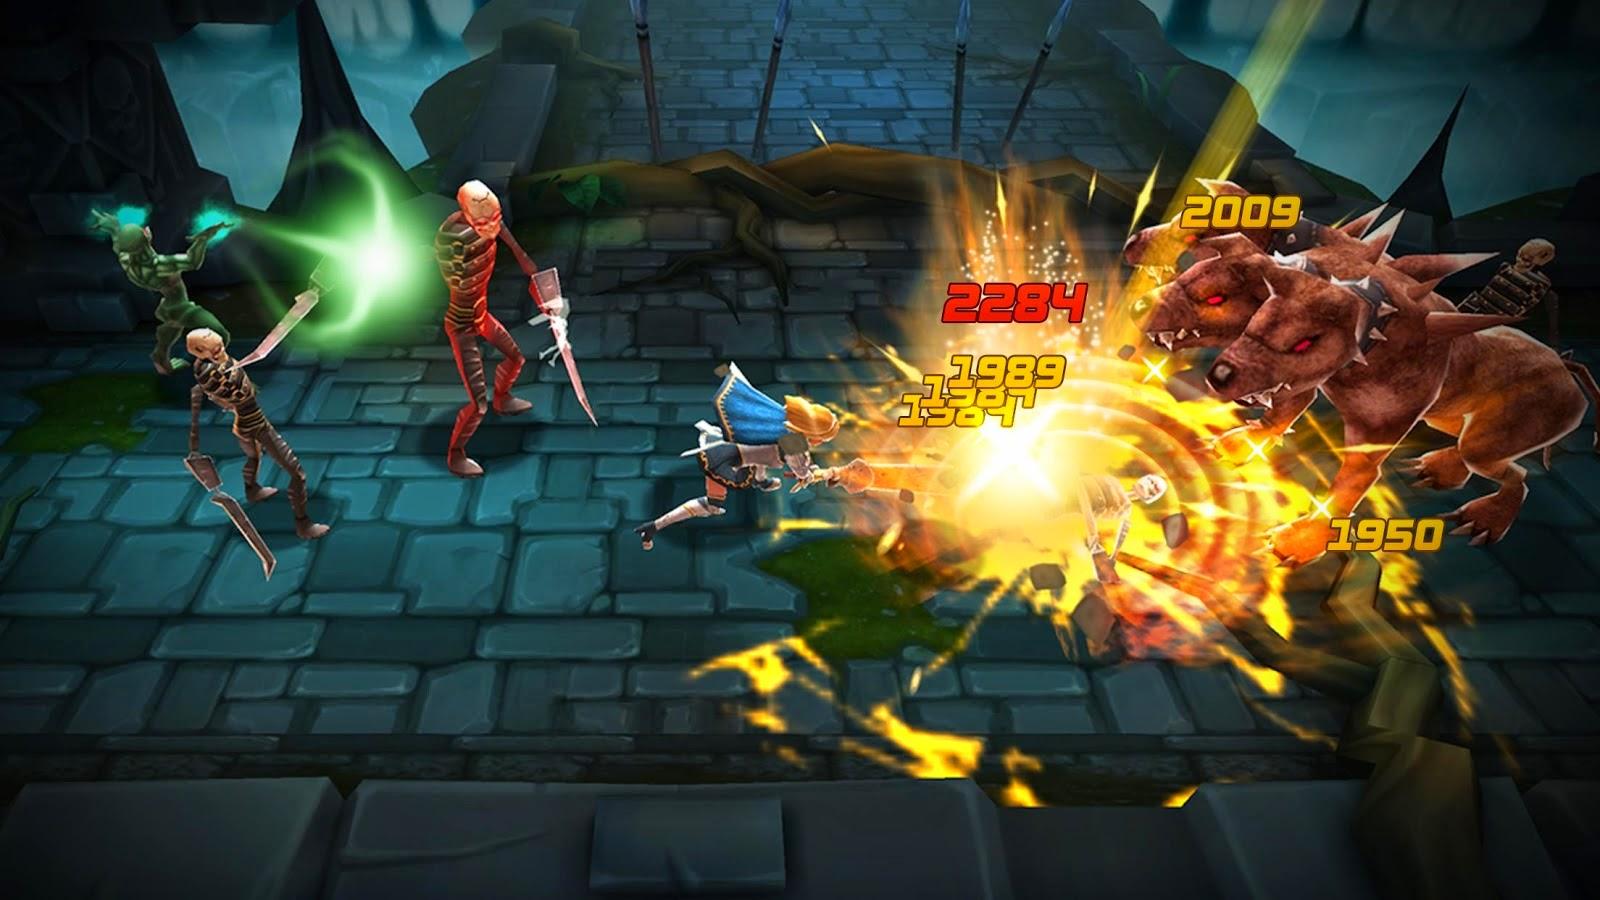 Game RPG Action 3D: Blade Warrior Terbaru 2015 APK Android Gratis ...